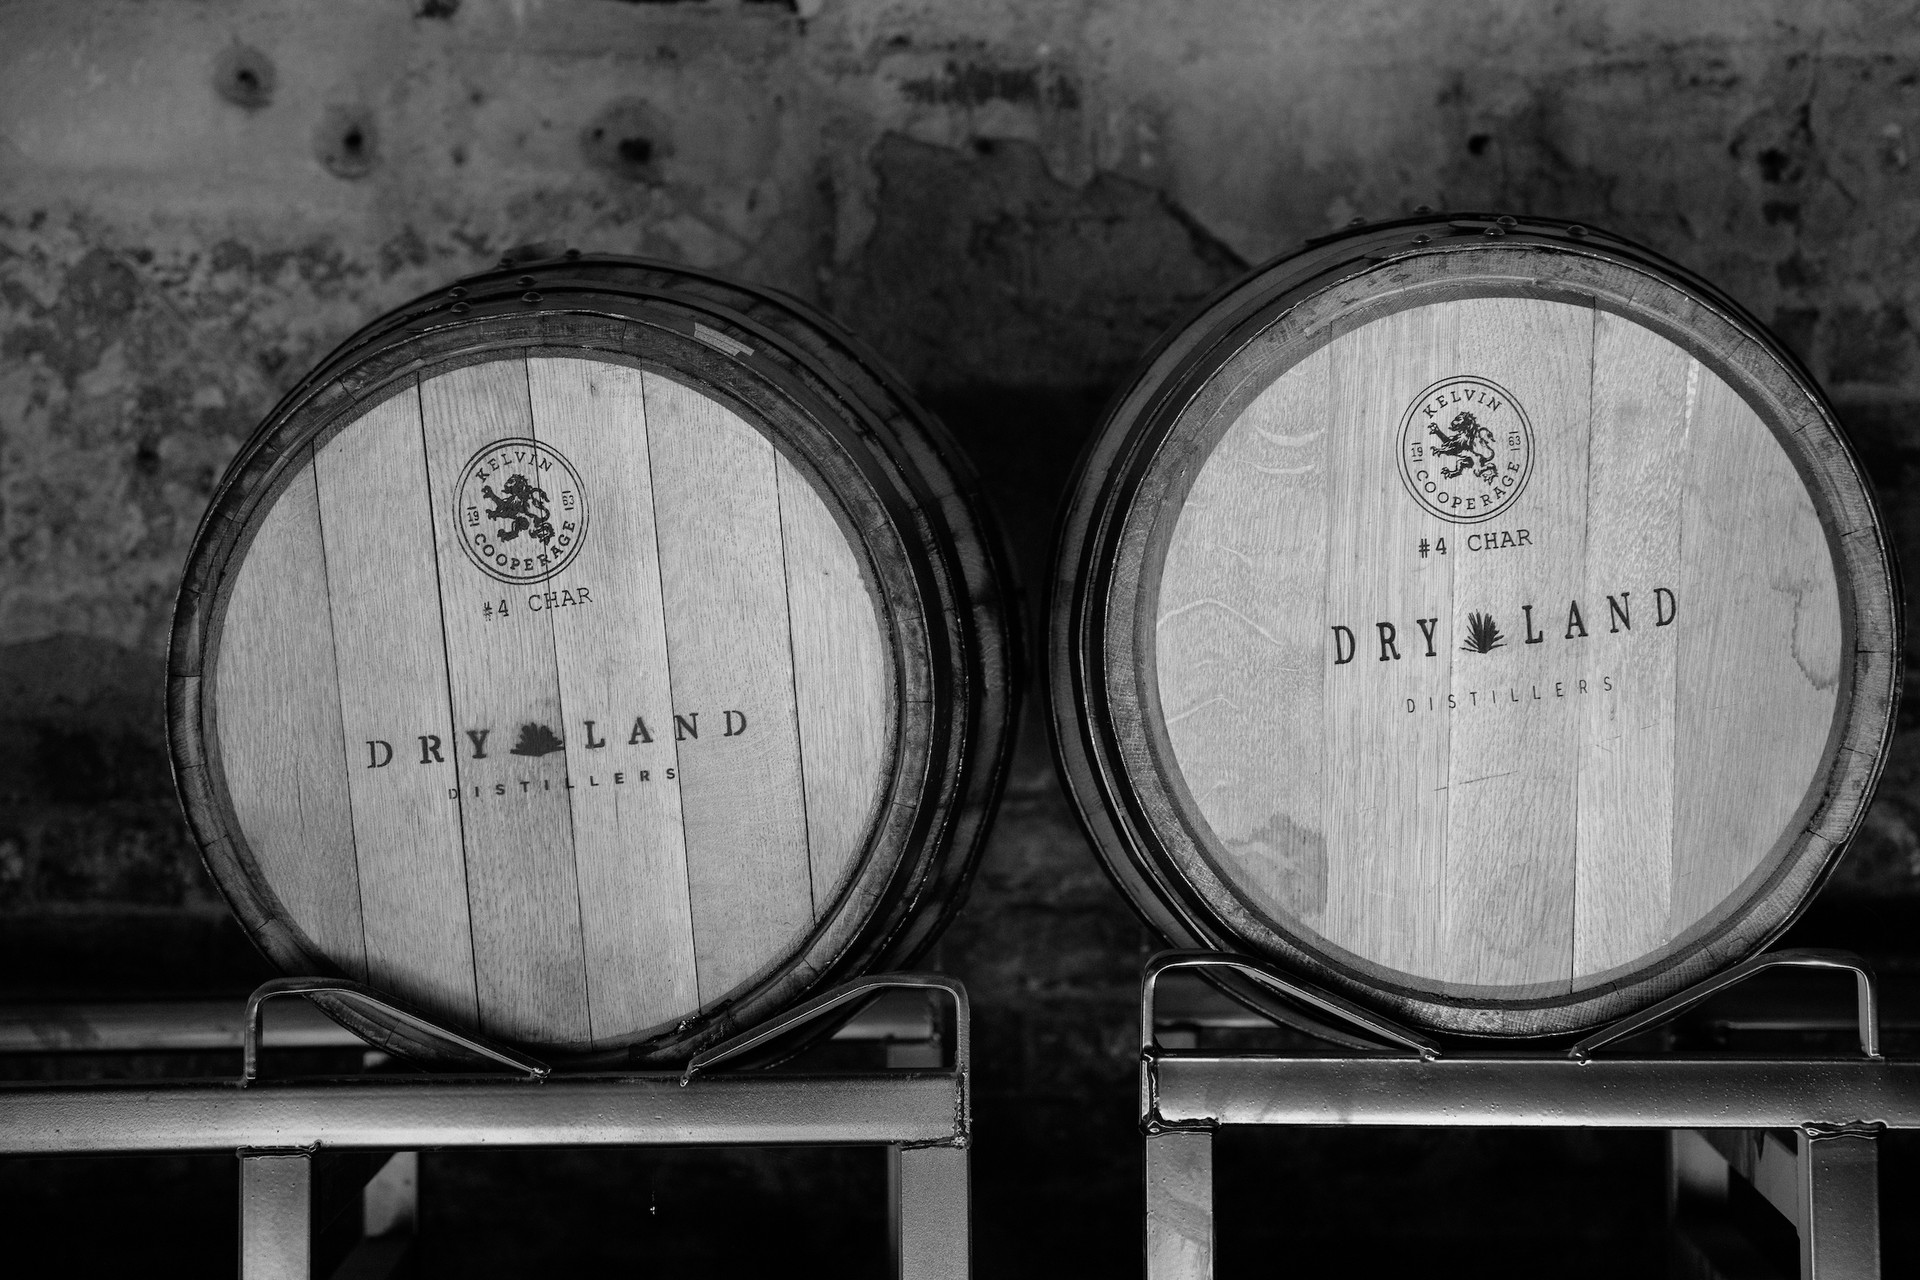 Dry Land Distillers